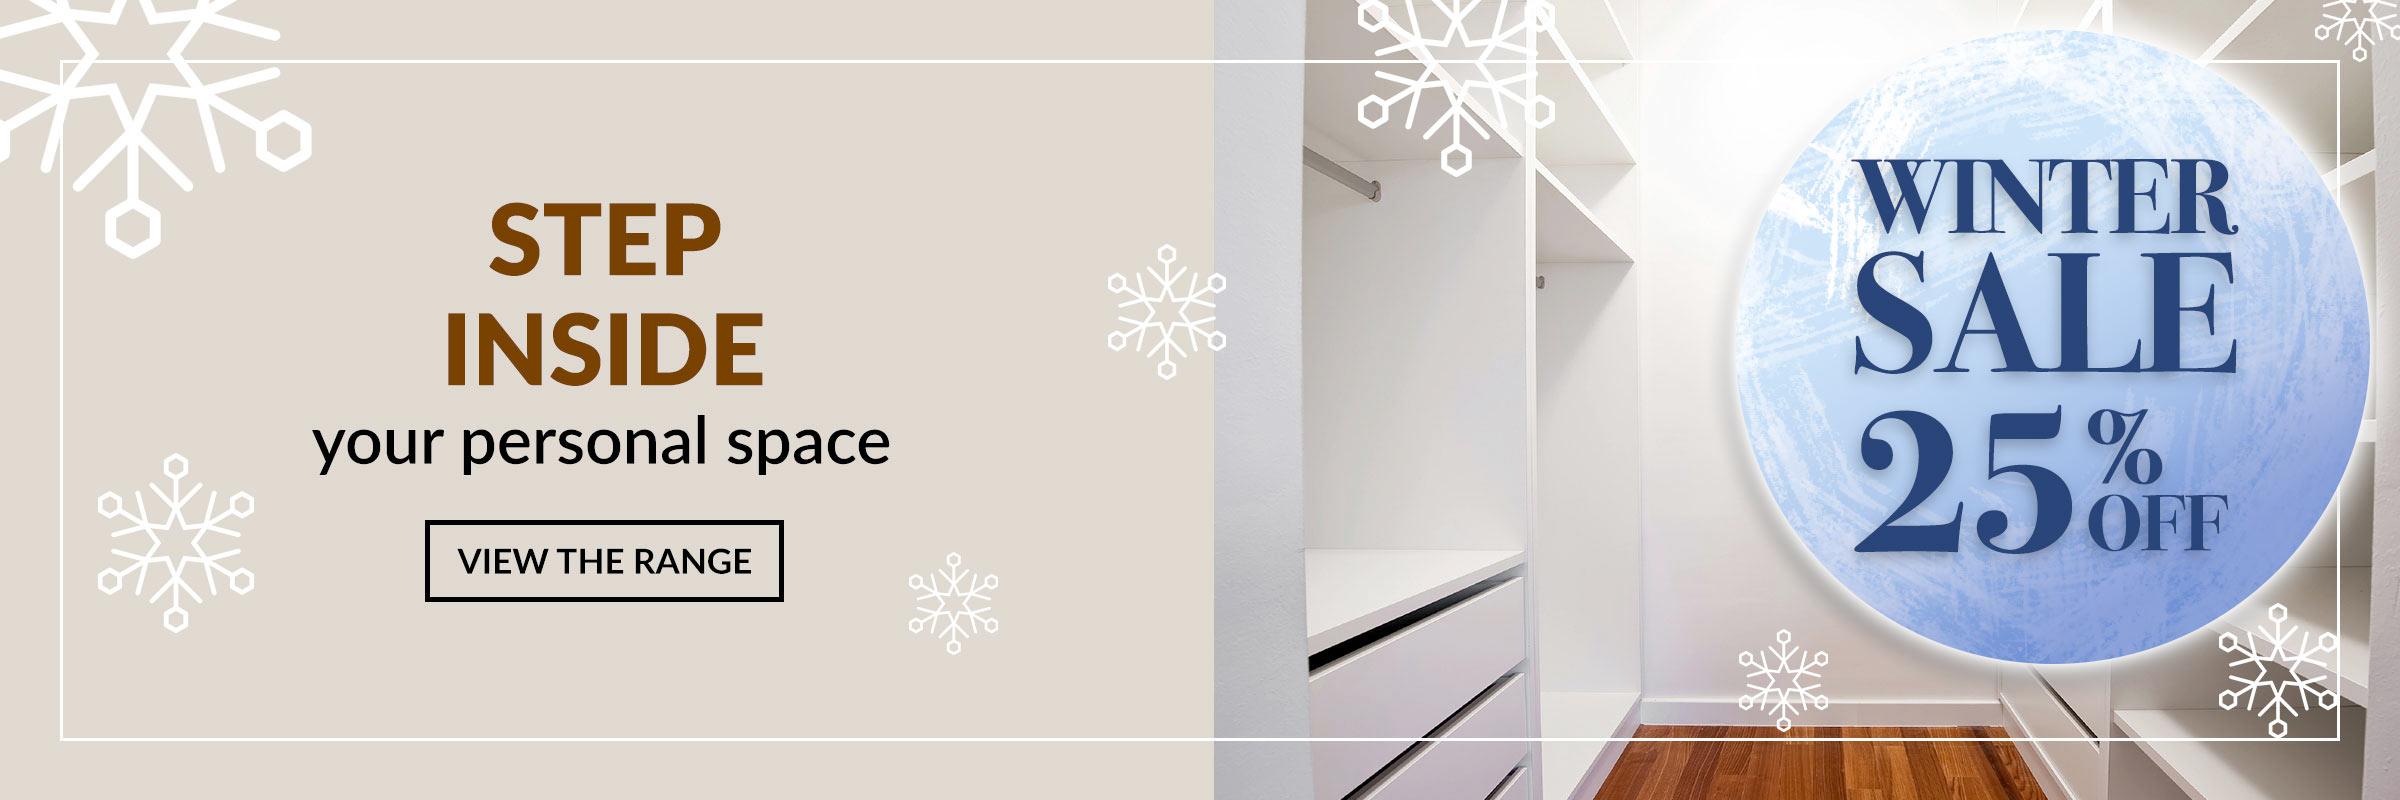 step-inside-winter